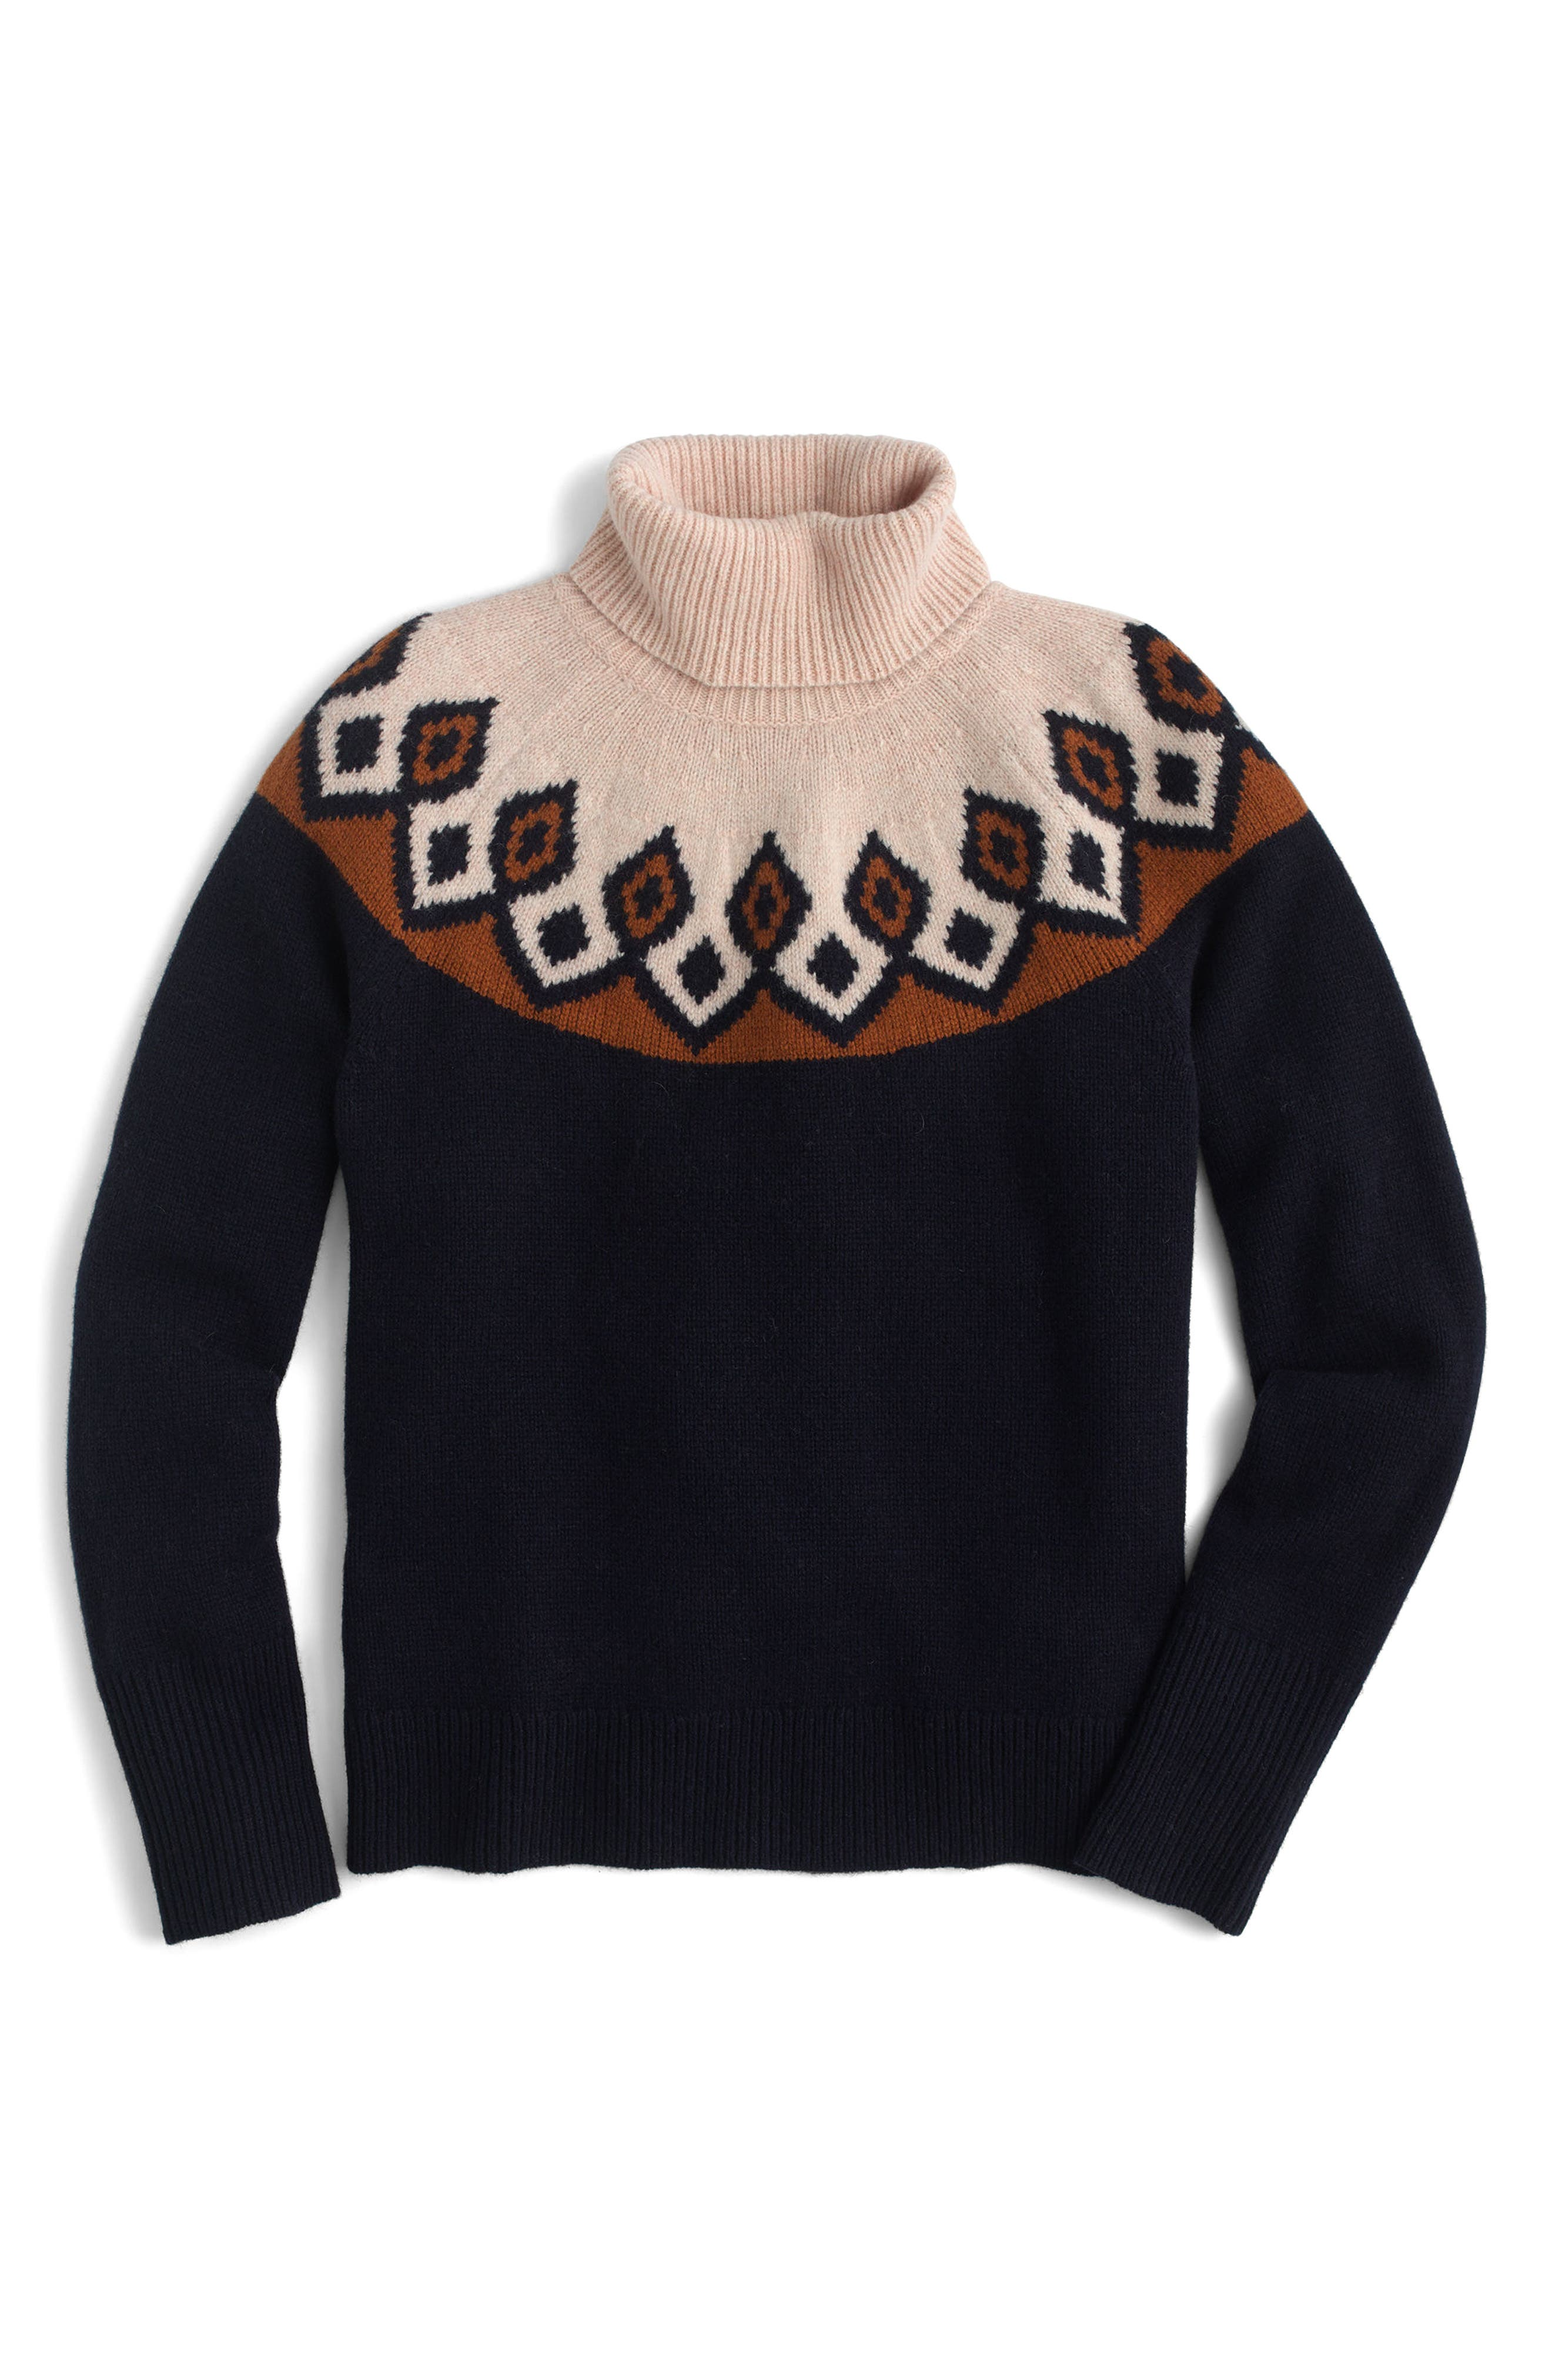 Alternate Image 3  - J.Crew Ambrose Fair Isle Merino Wool Sweater